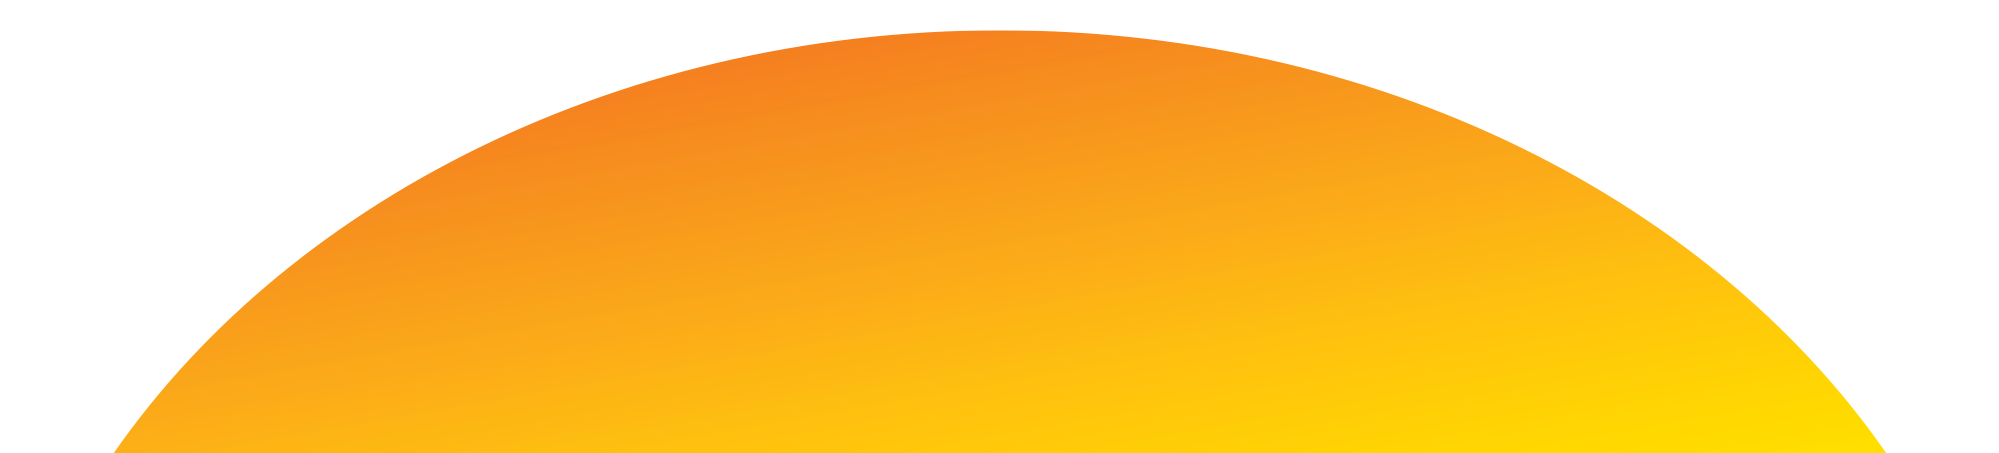 Sun_Crop.png